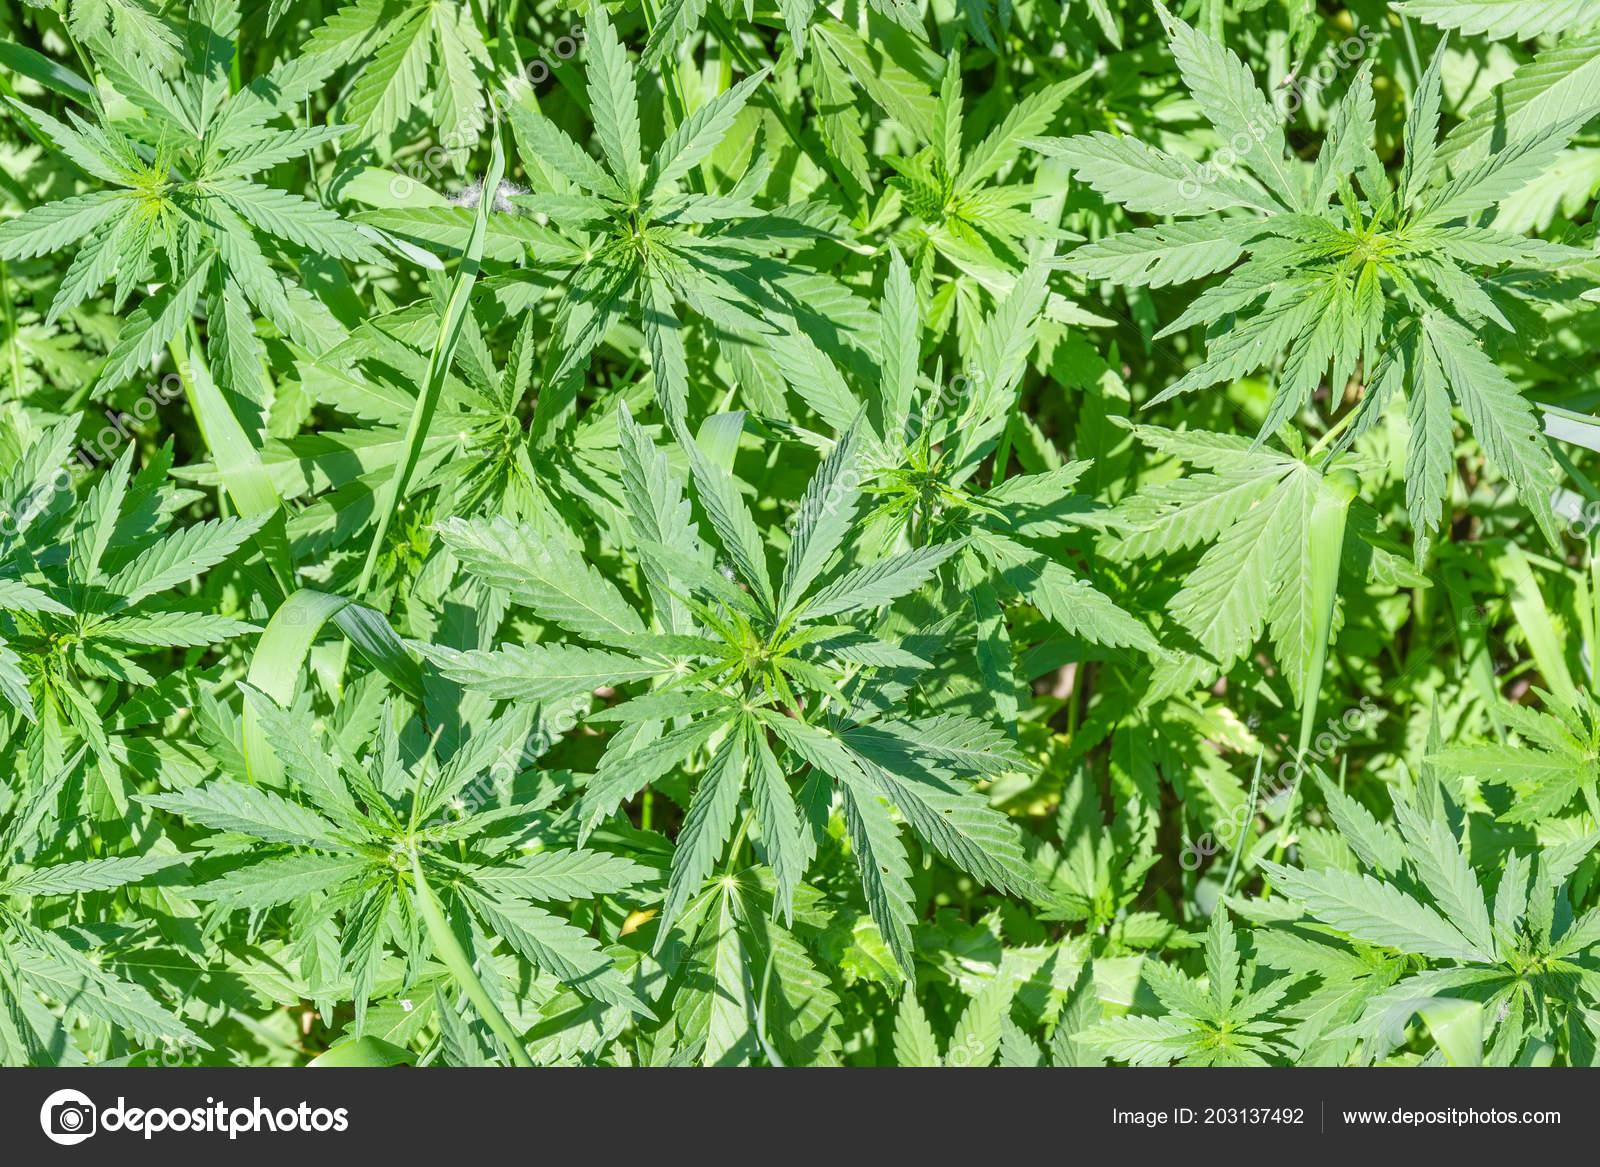 Pictures: wild hemp | Top View Young Plants Wild Growing